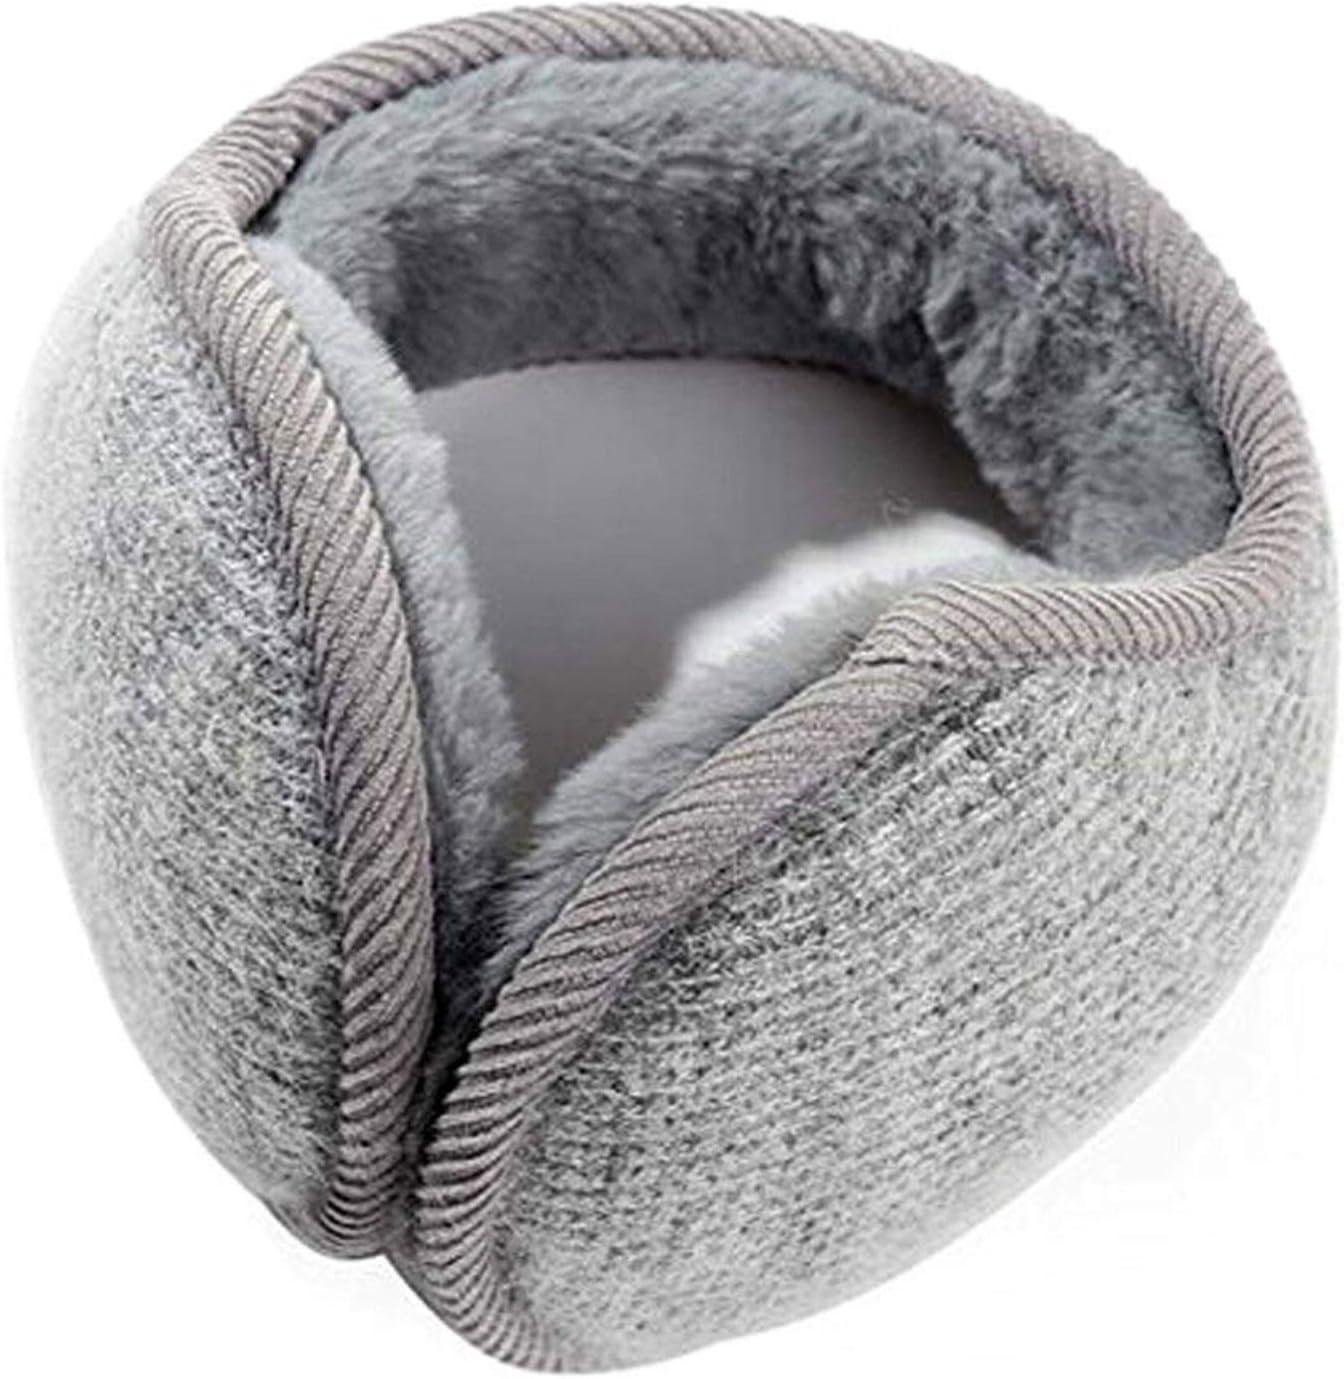 Mens Earlap Womens Mens Winter Outdoors Warmers Ear Bags Earmuffs Bandless Fleece Ear Earcap Beige Black Gray Pink Running (Color : Gray)